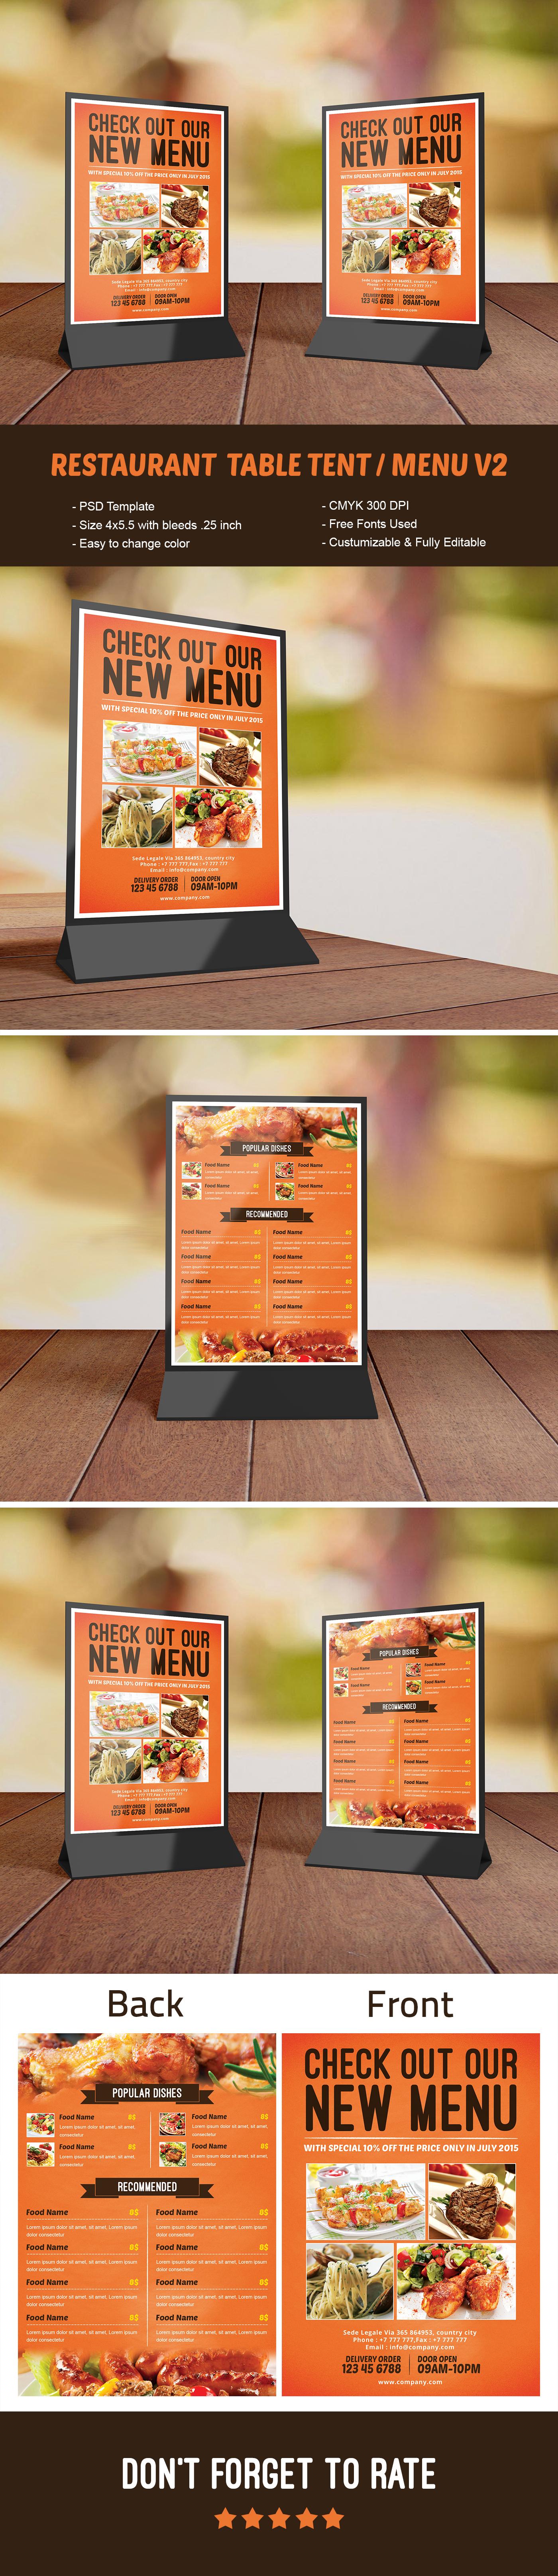 Restaurant Table Tent Menu V Template On Behance Mockups - Restaurant table tents